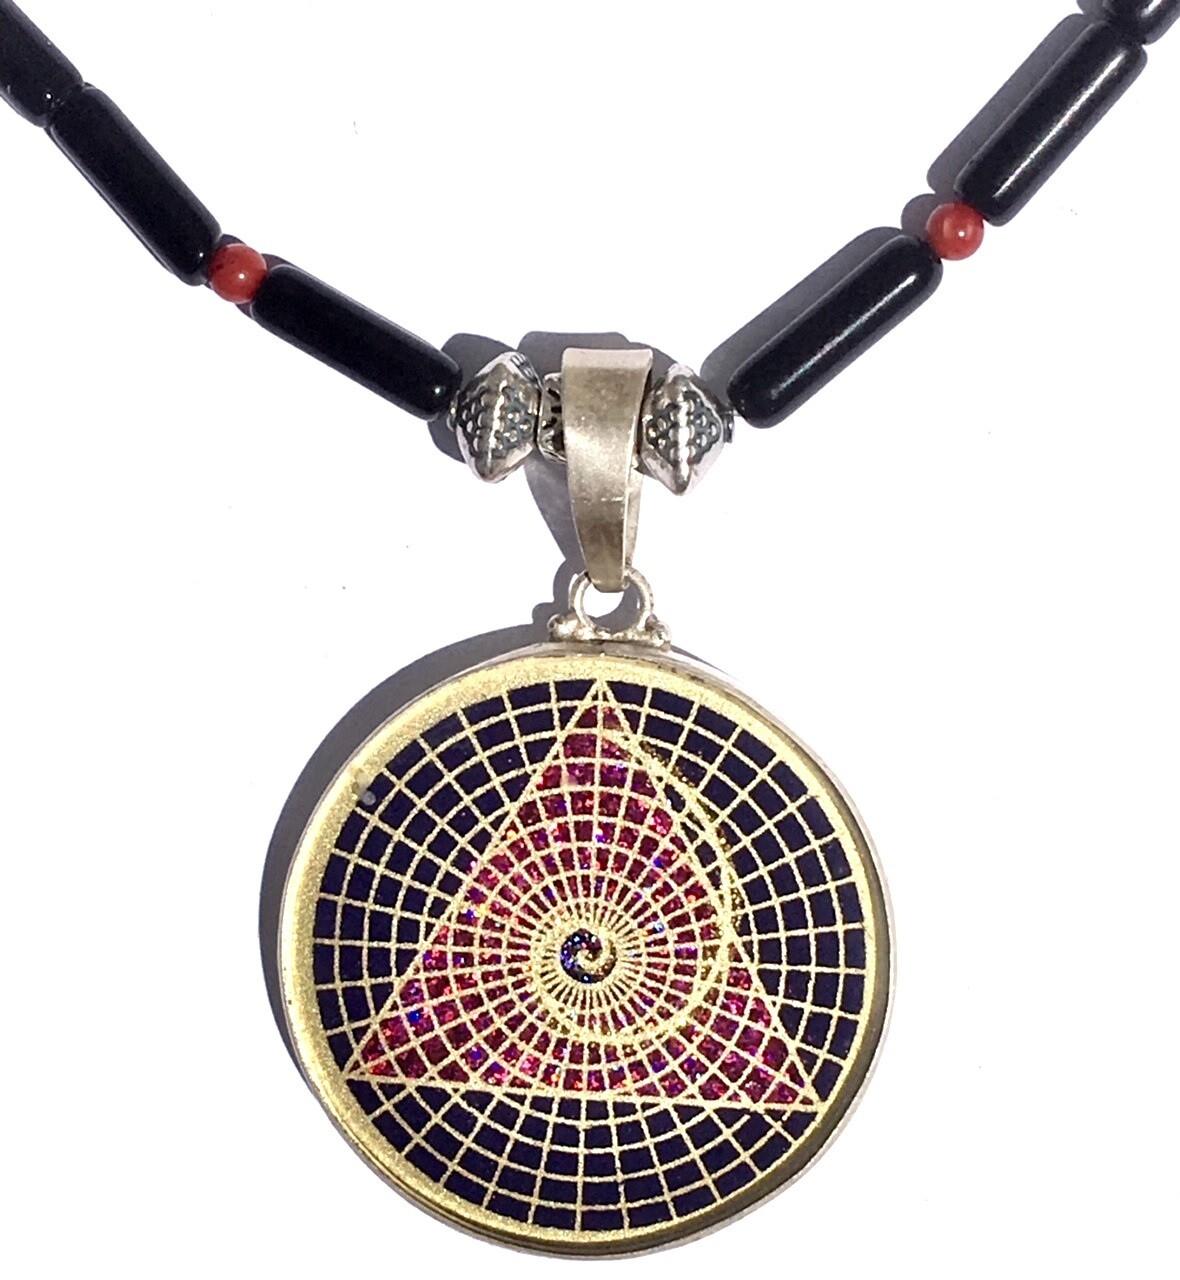 Colar Grande Geometria Sagrada Triangulo Espiral da Vida (lapis lazuli e turmalina preta)